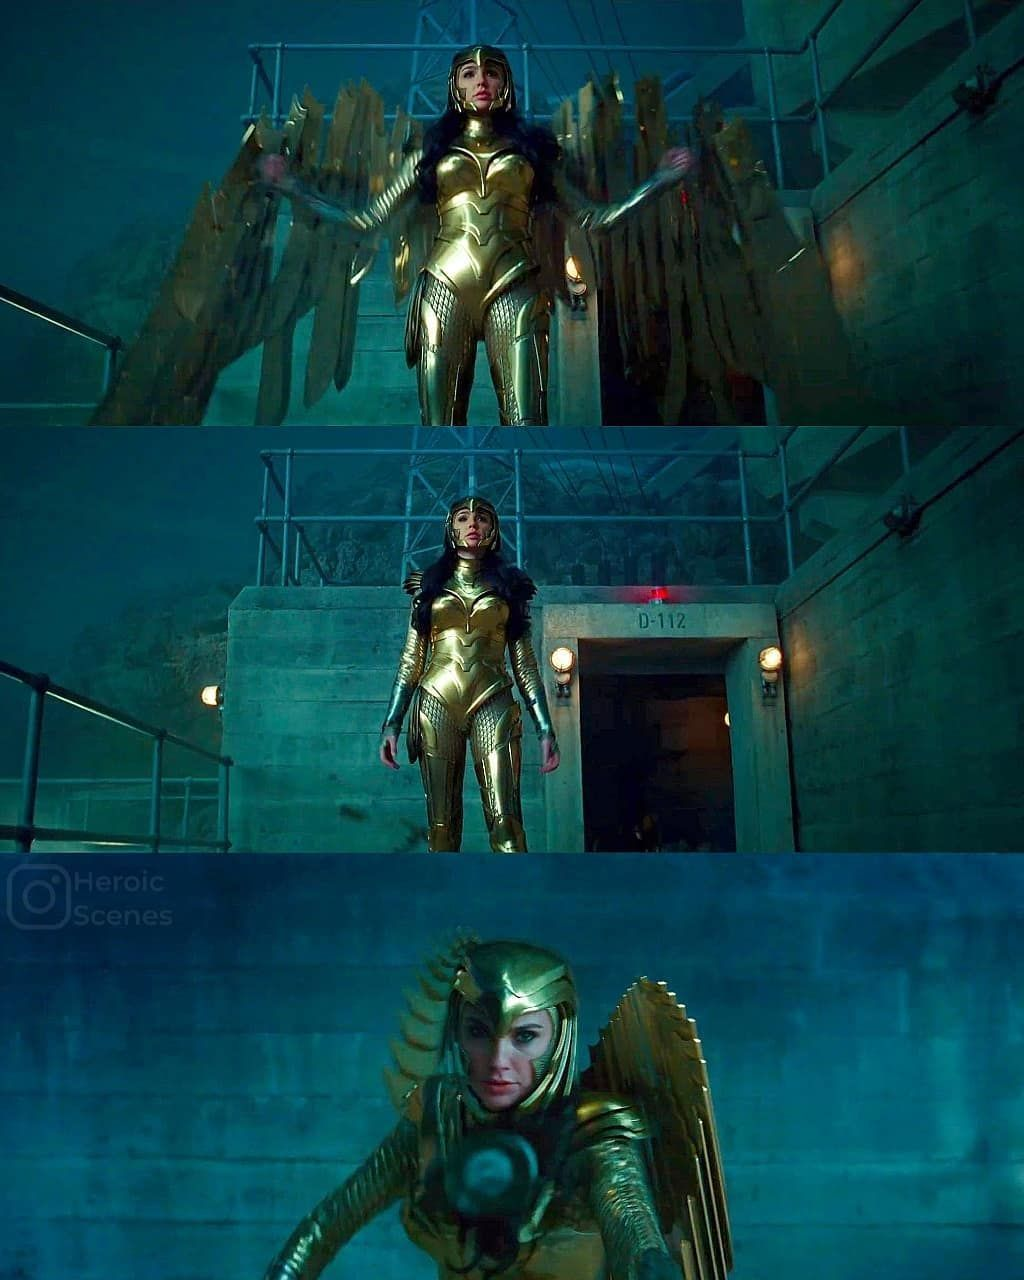 Heroic Scenes On Instagram The Wonder Women 1984 Trailer Was So Good Q Did You See The New Wonder Women Trailer Blog Do Armindo In 2020 Wonder Woman Art Gal